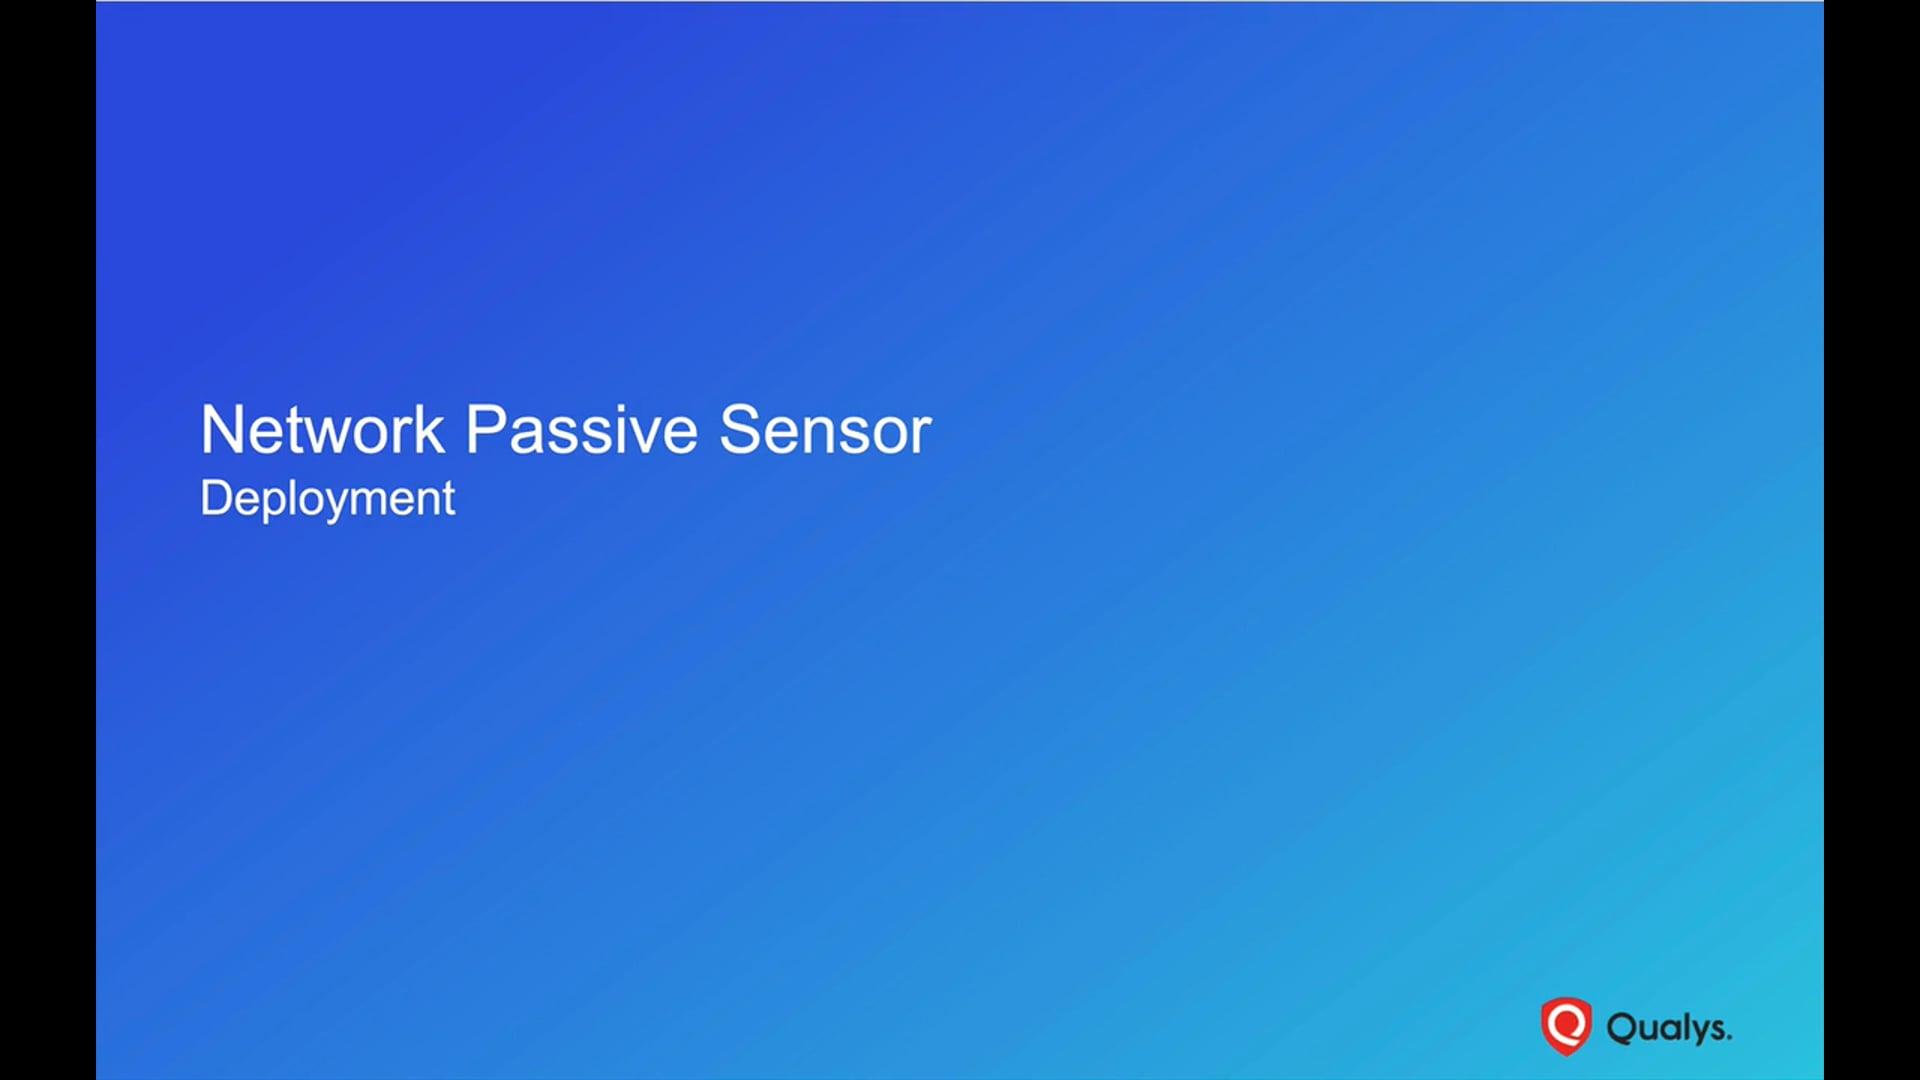 Network Passive Sensor Training Video